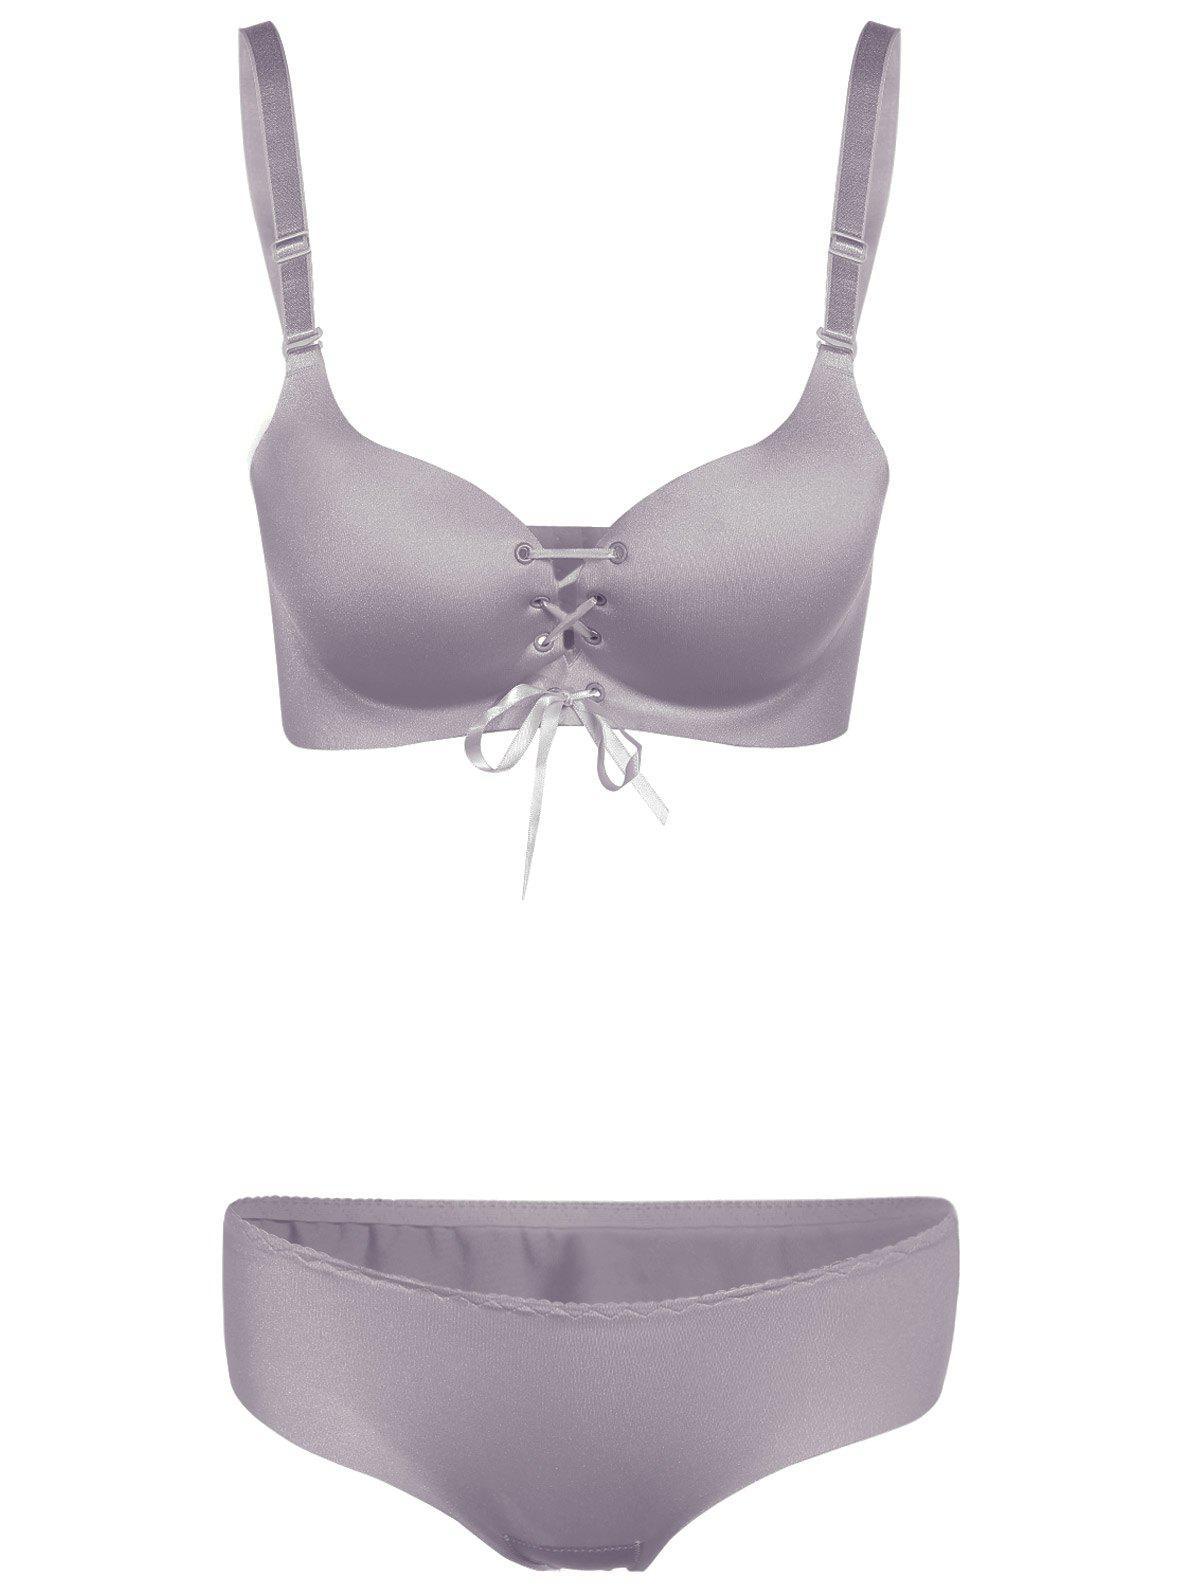 Push Up Lace Up Seamless Underwear Bra Set 197611402